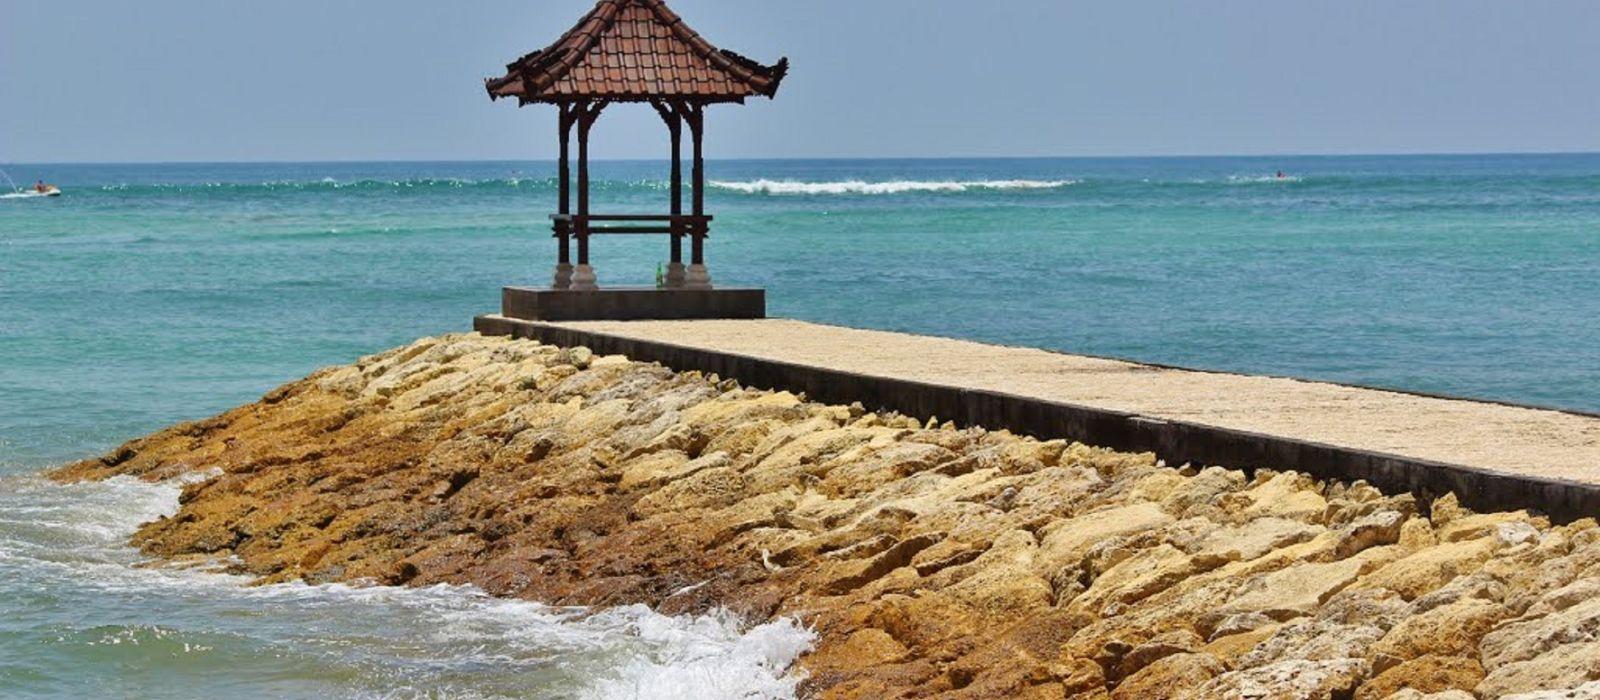 Hotel The Laguna, a Luxury Collection Resort & Spa, Nusa Dua, Bali Indonesien